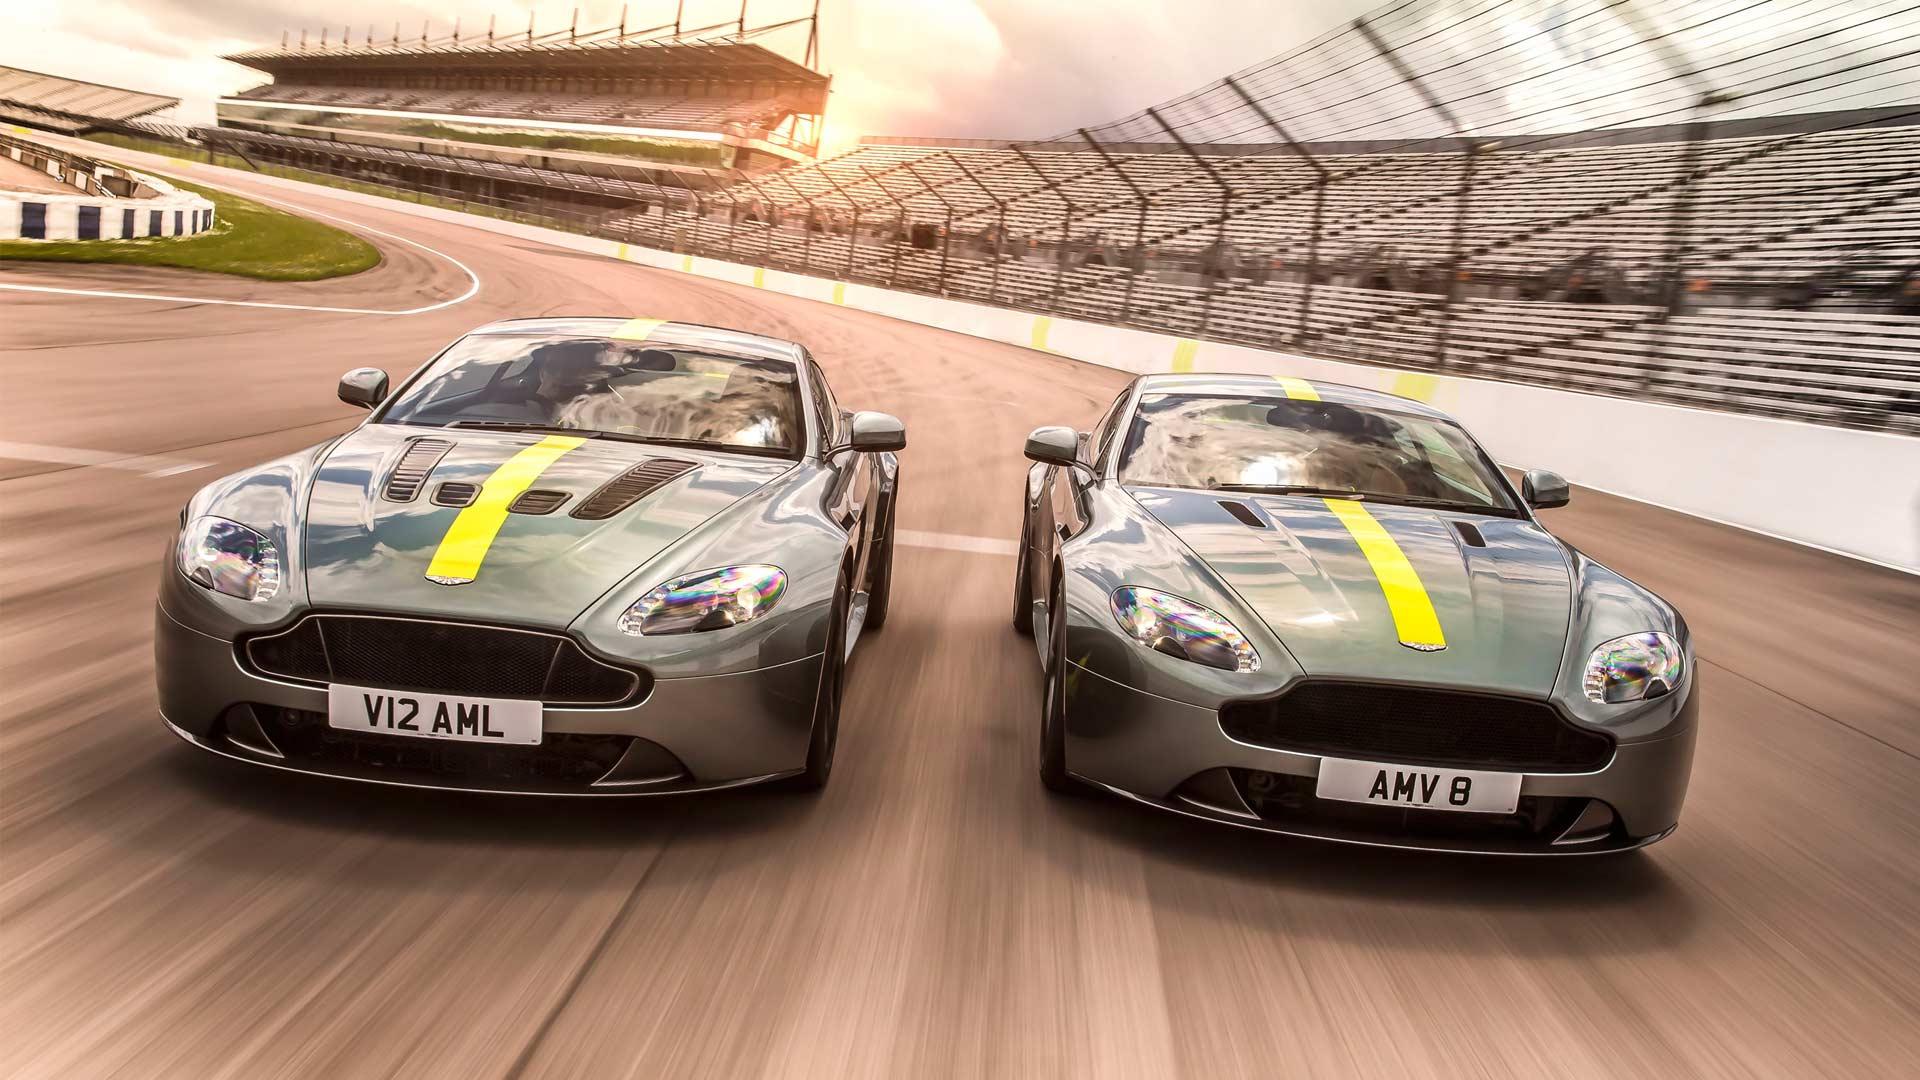 Aston-Martin-Vantage-AMR-V8-and-V12